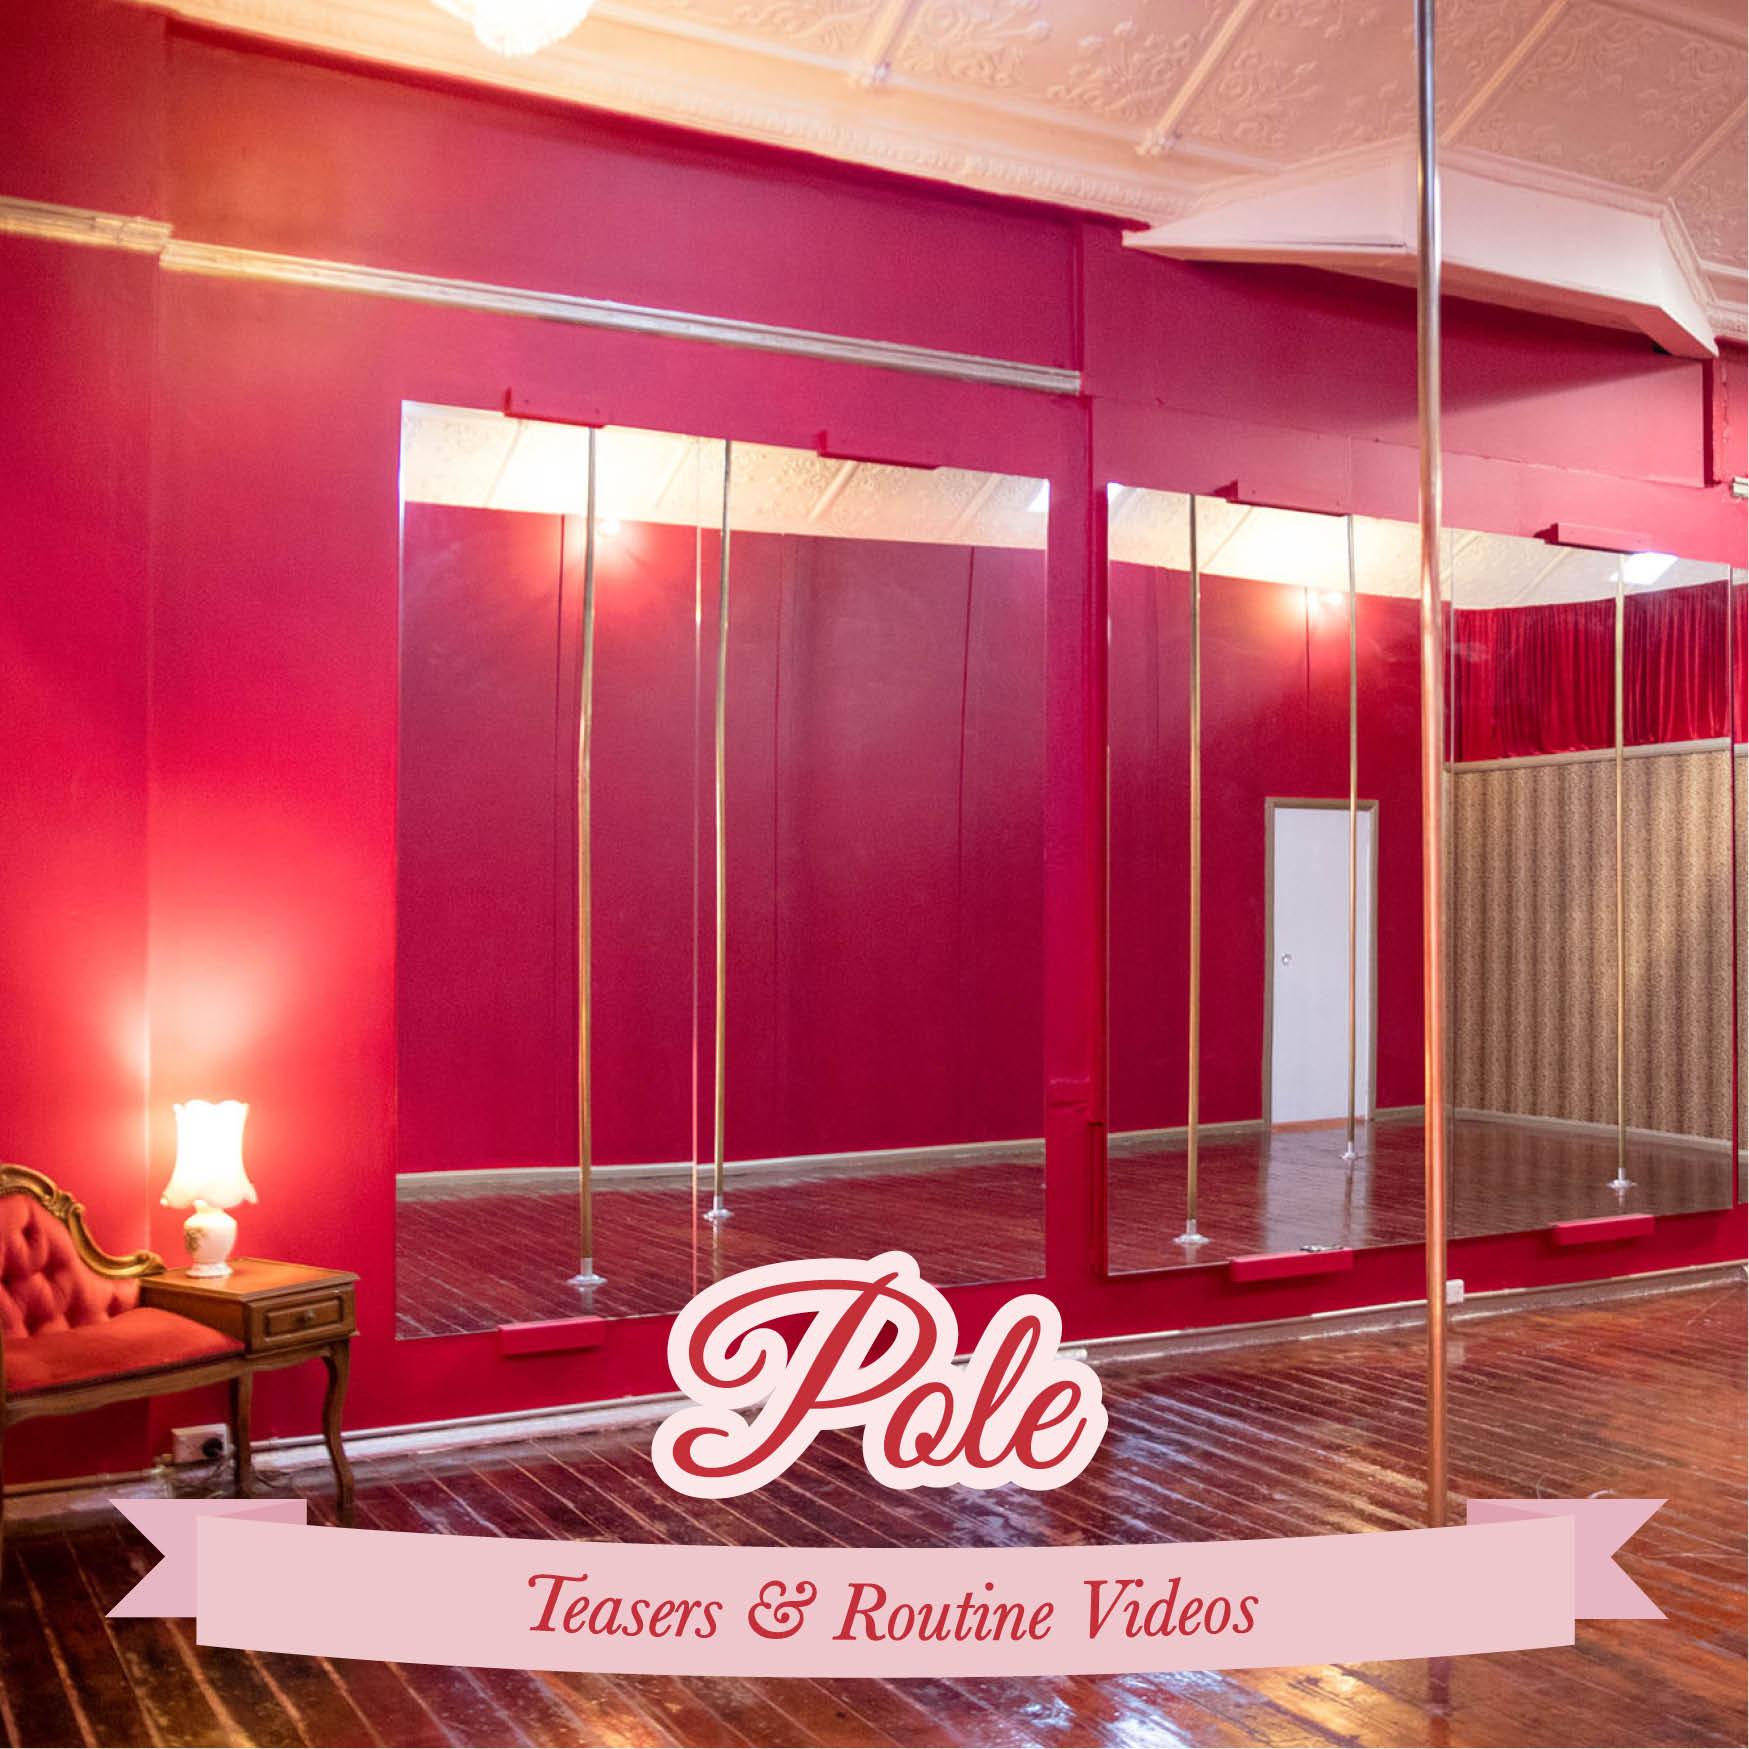 Pole-Videos.jpg